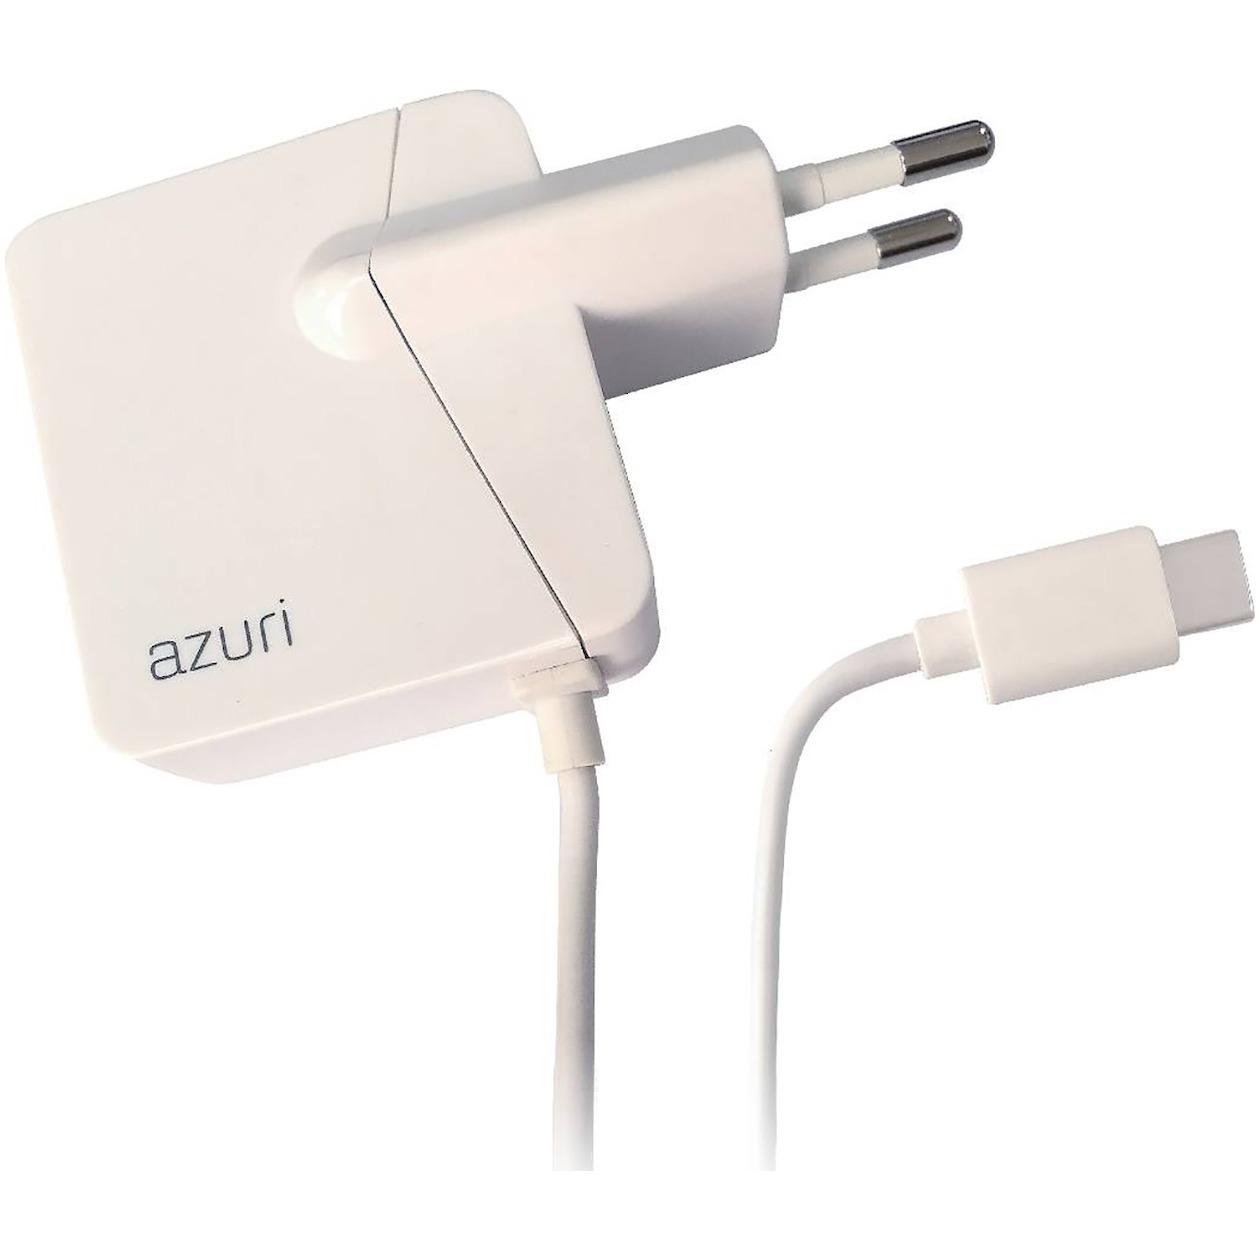 Afbeelding van Azuri oplader Thuislader USB type C 2.4amp 1.2m wit